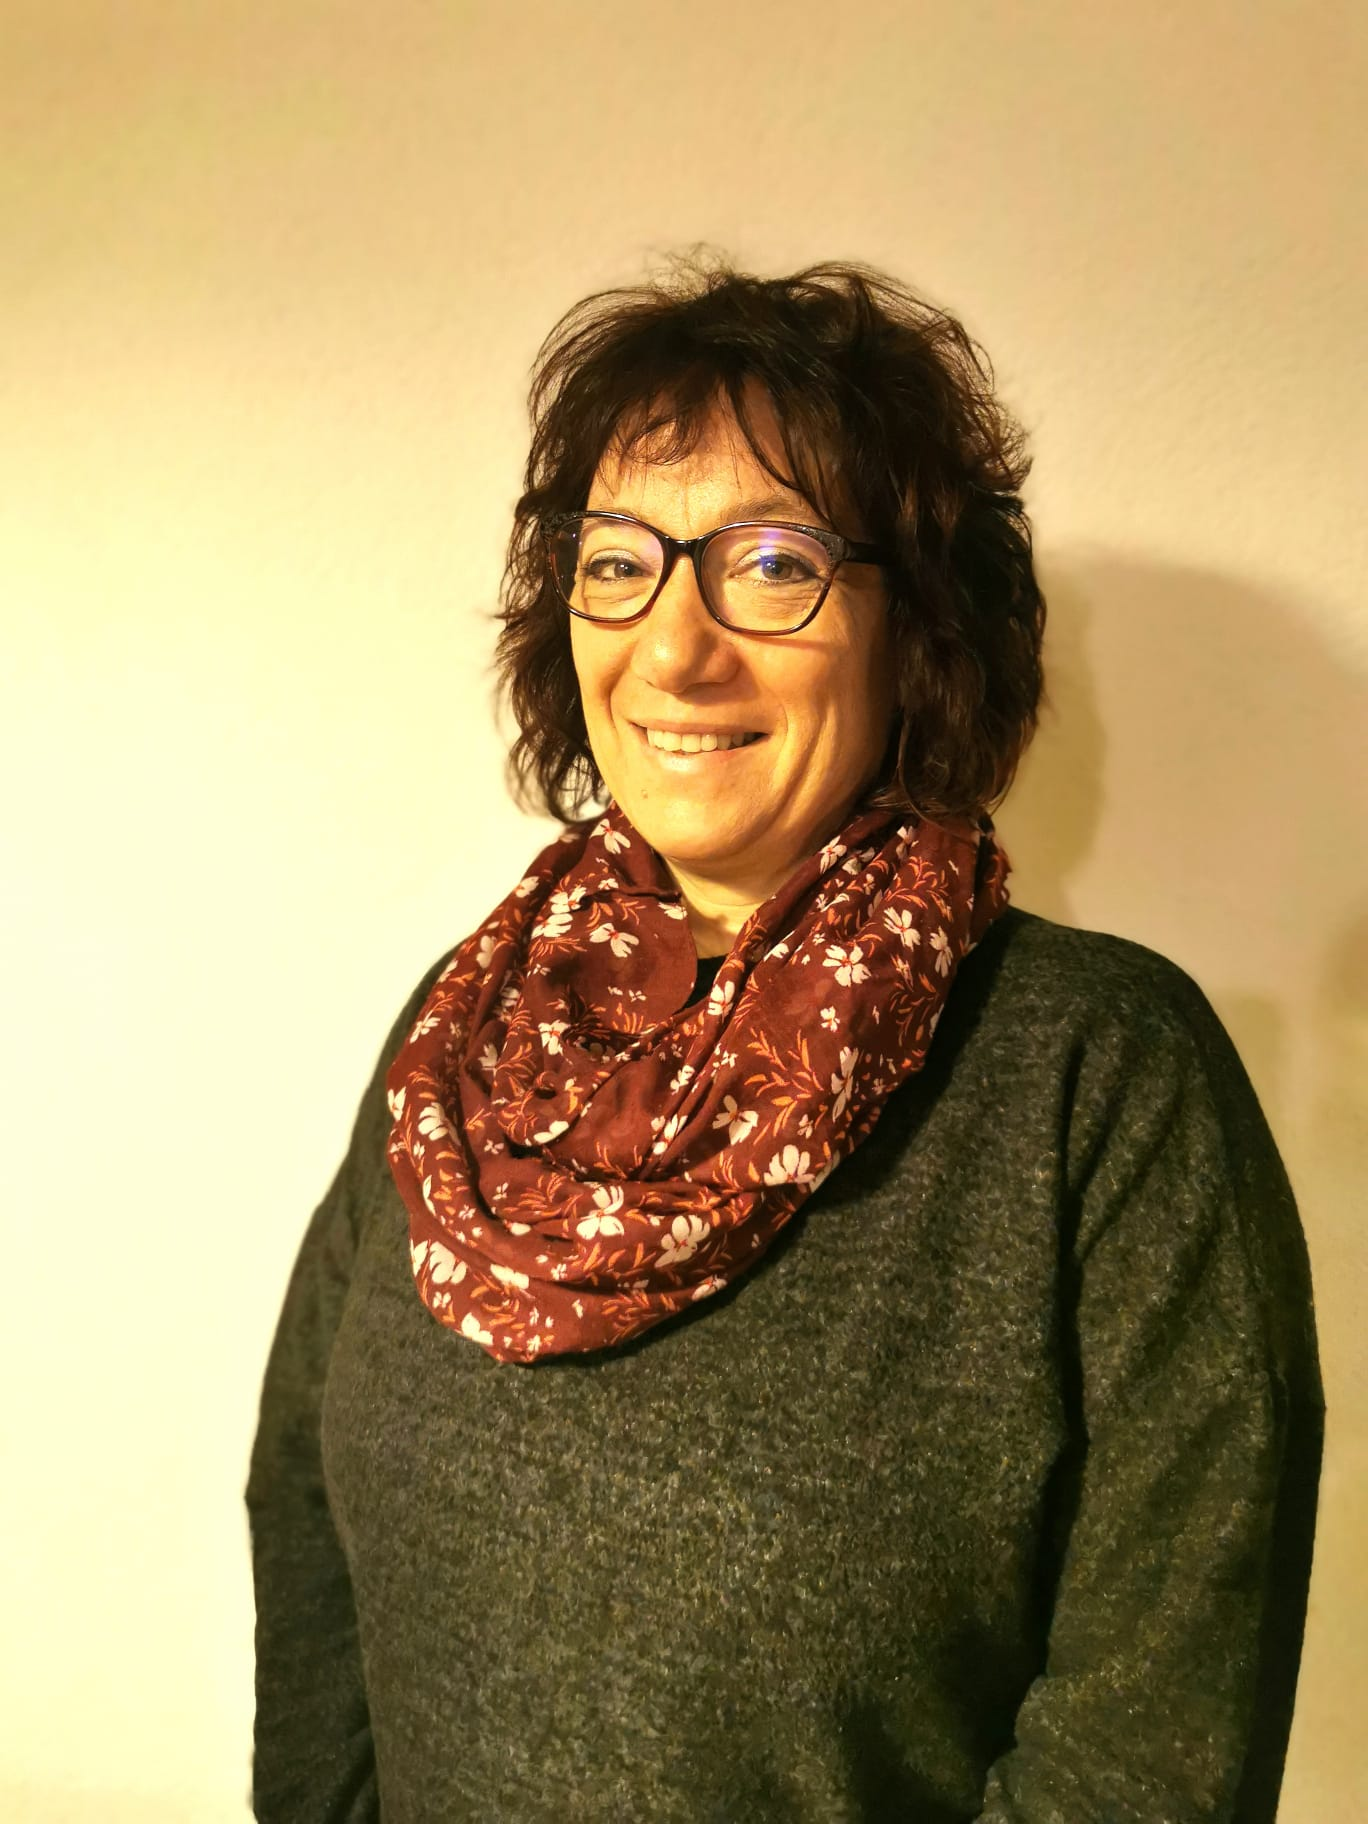 Stéphanie Borgeaud